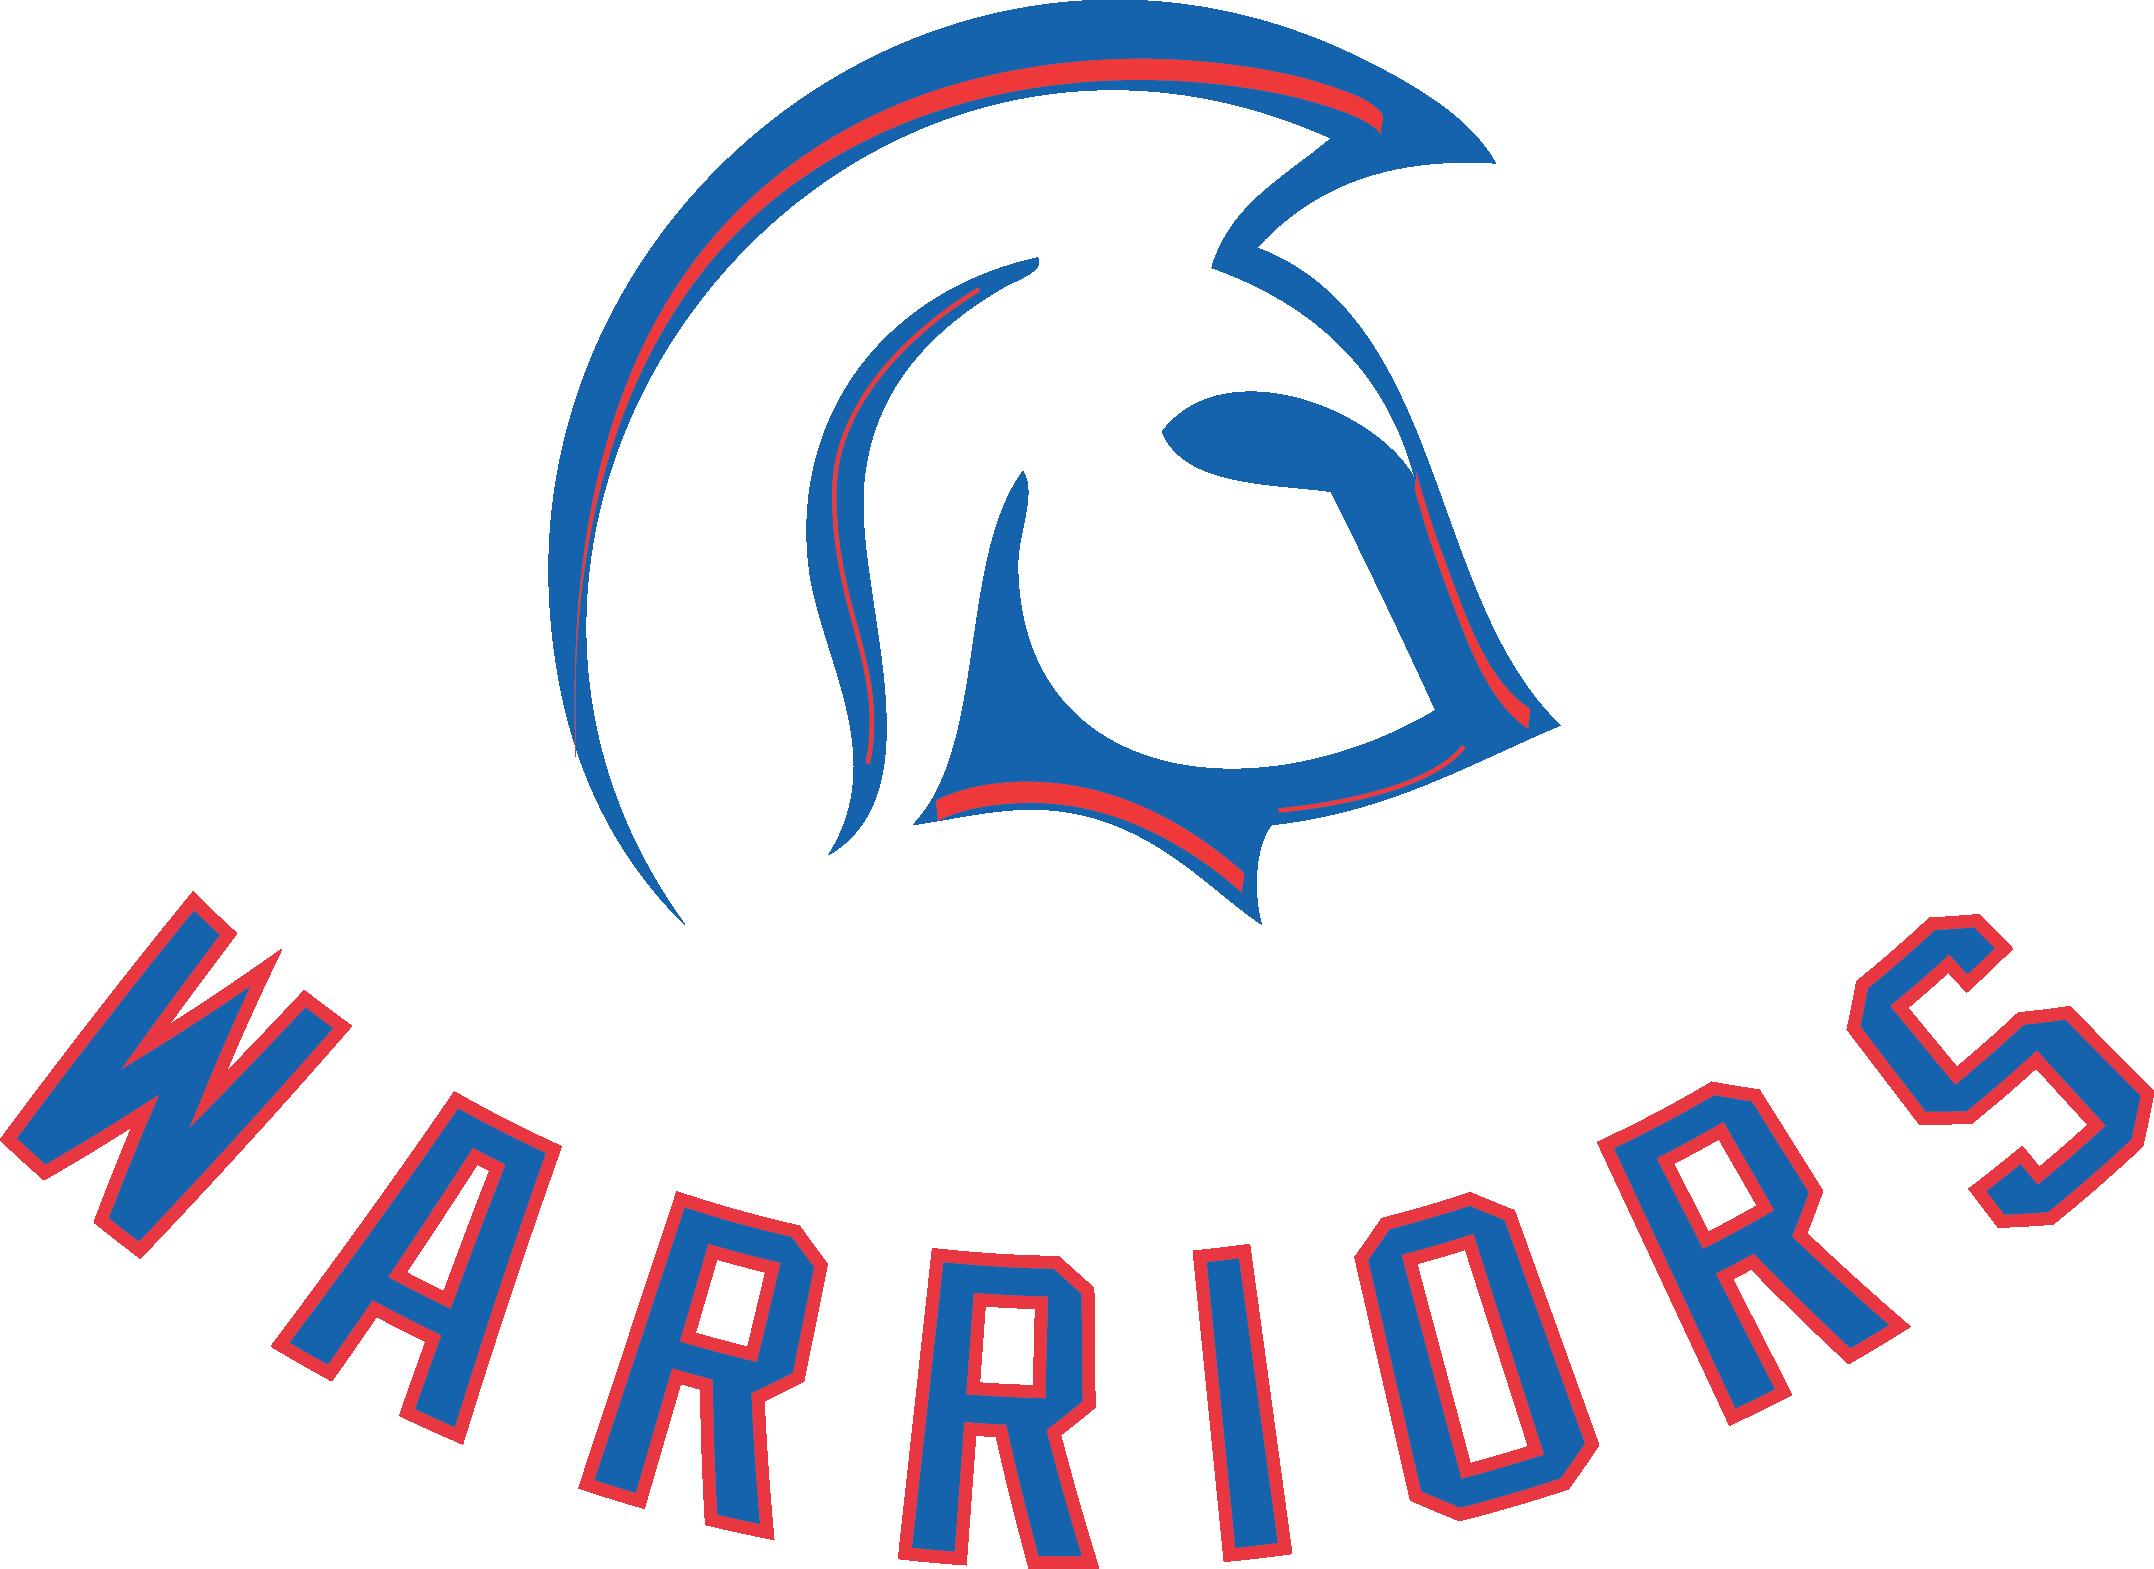 Warrior clipart basketball warriors. Transparent background png mart